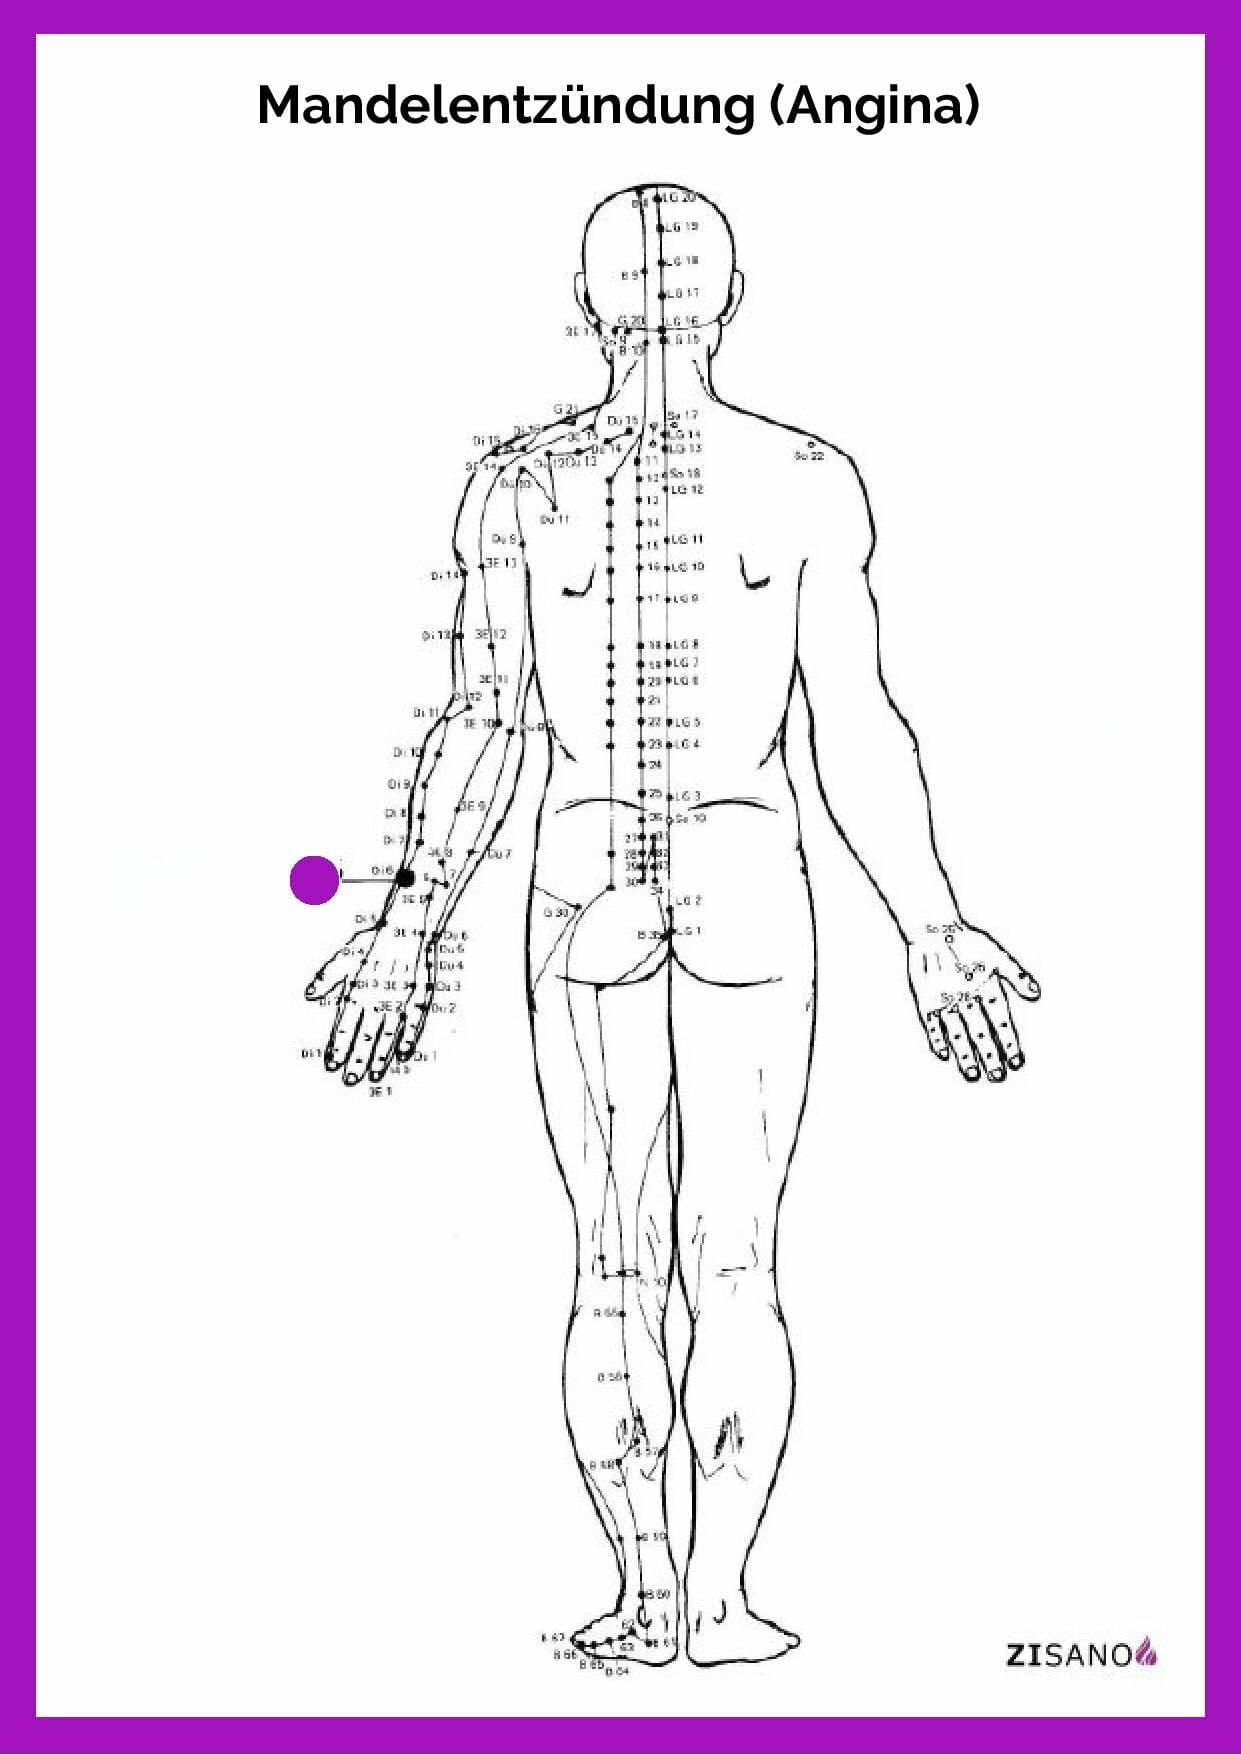 Meridiane - Mandelentzündung - Angina - Beschwerden